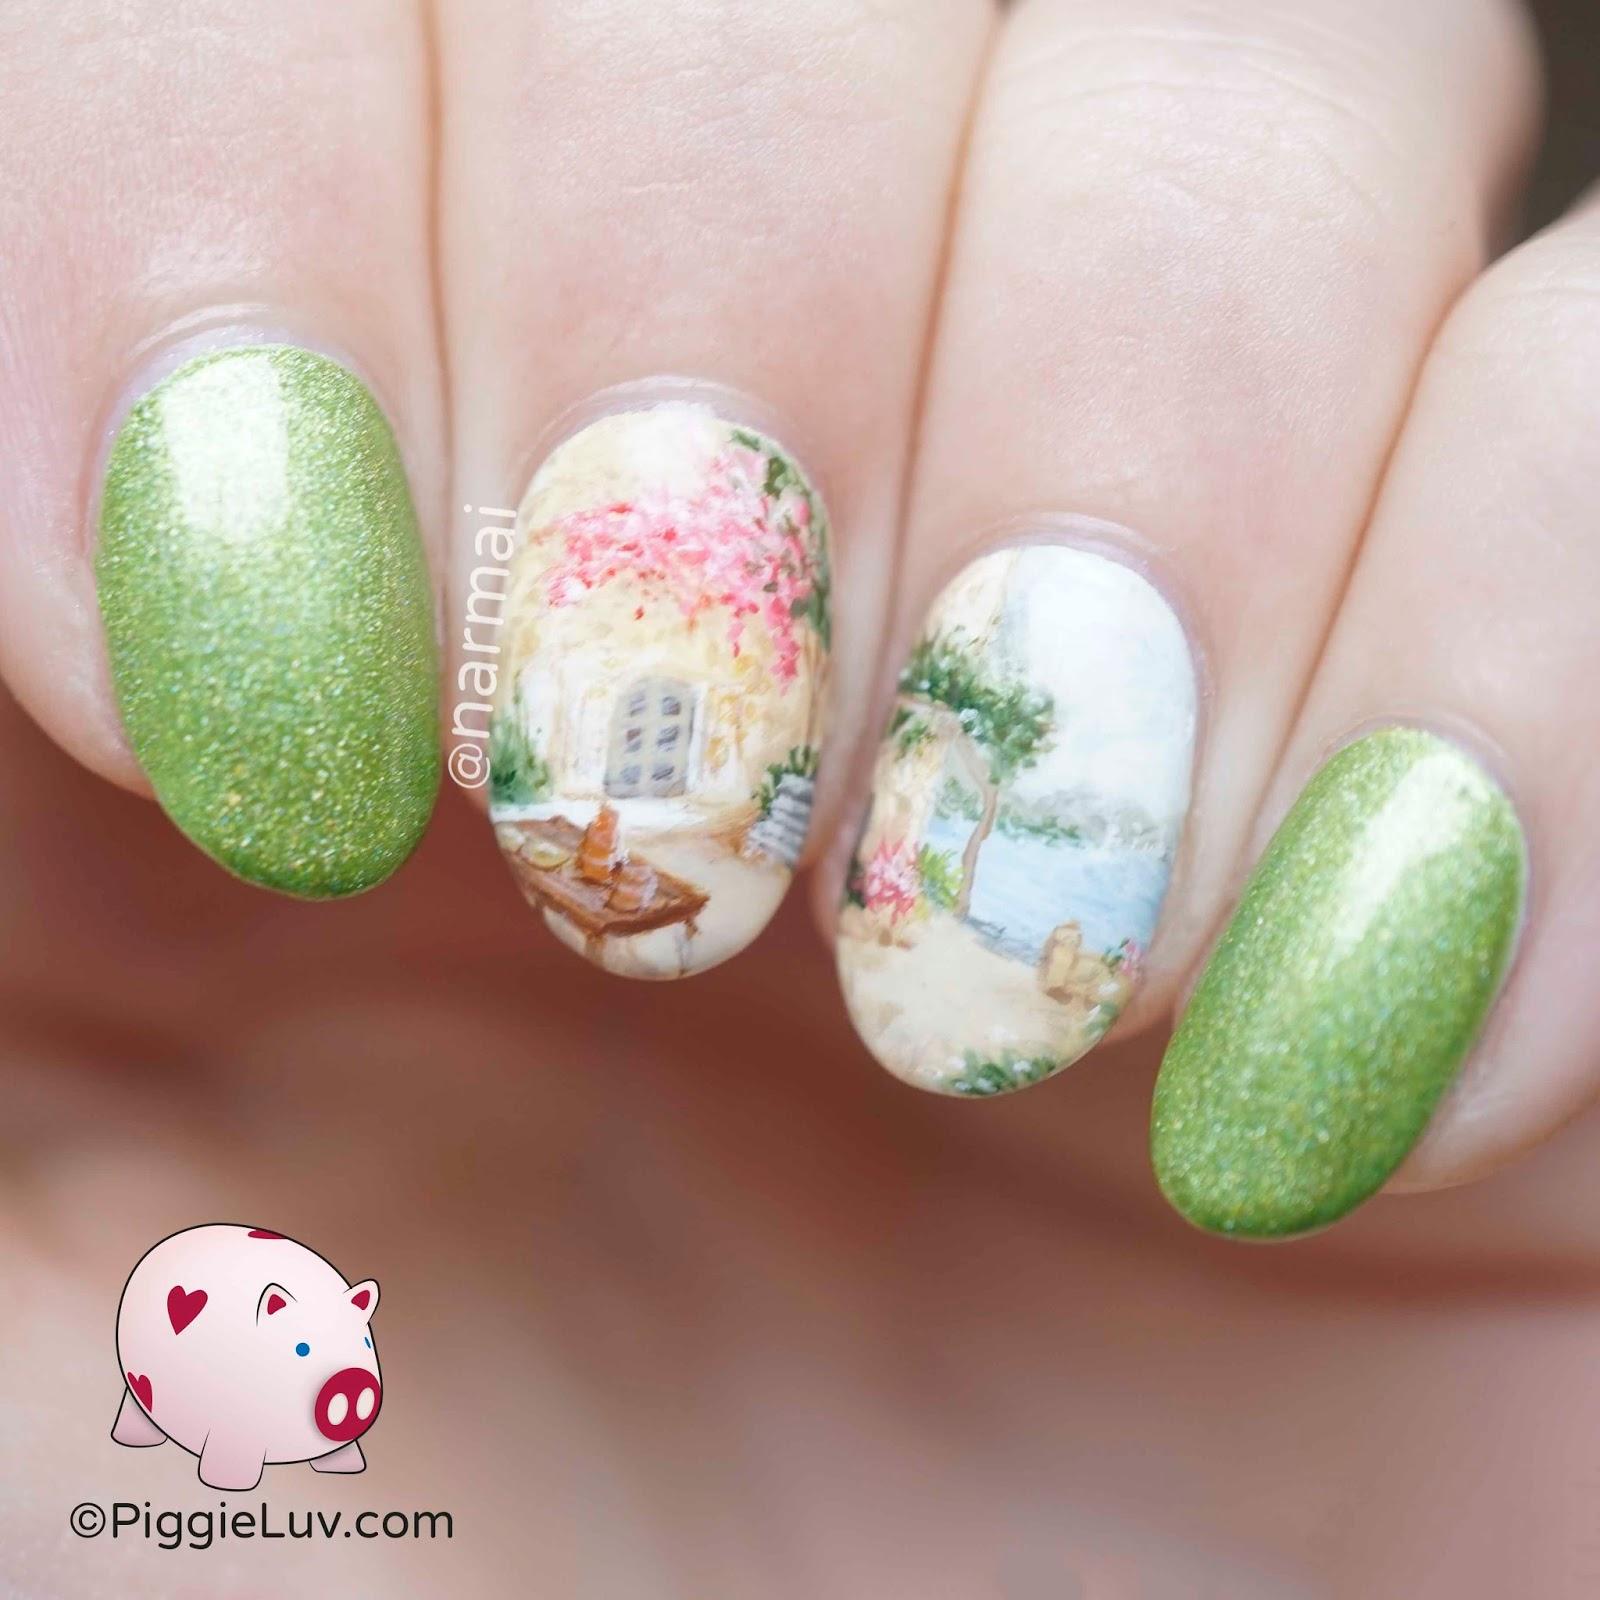 Piggieluv Freehand Summer Terrace Nail Art